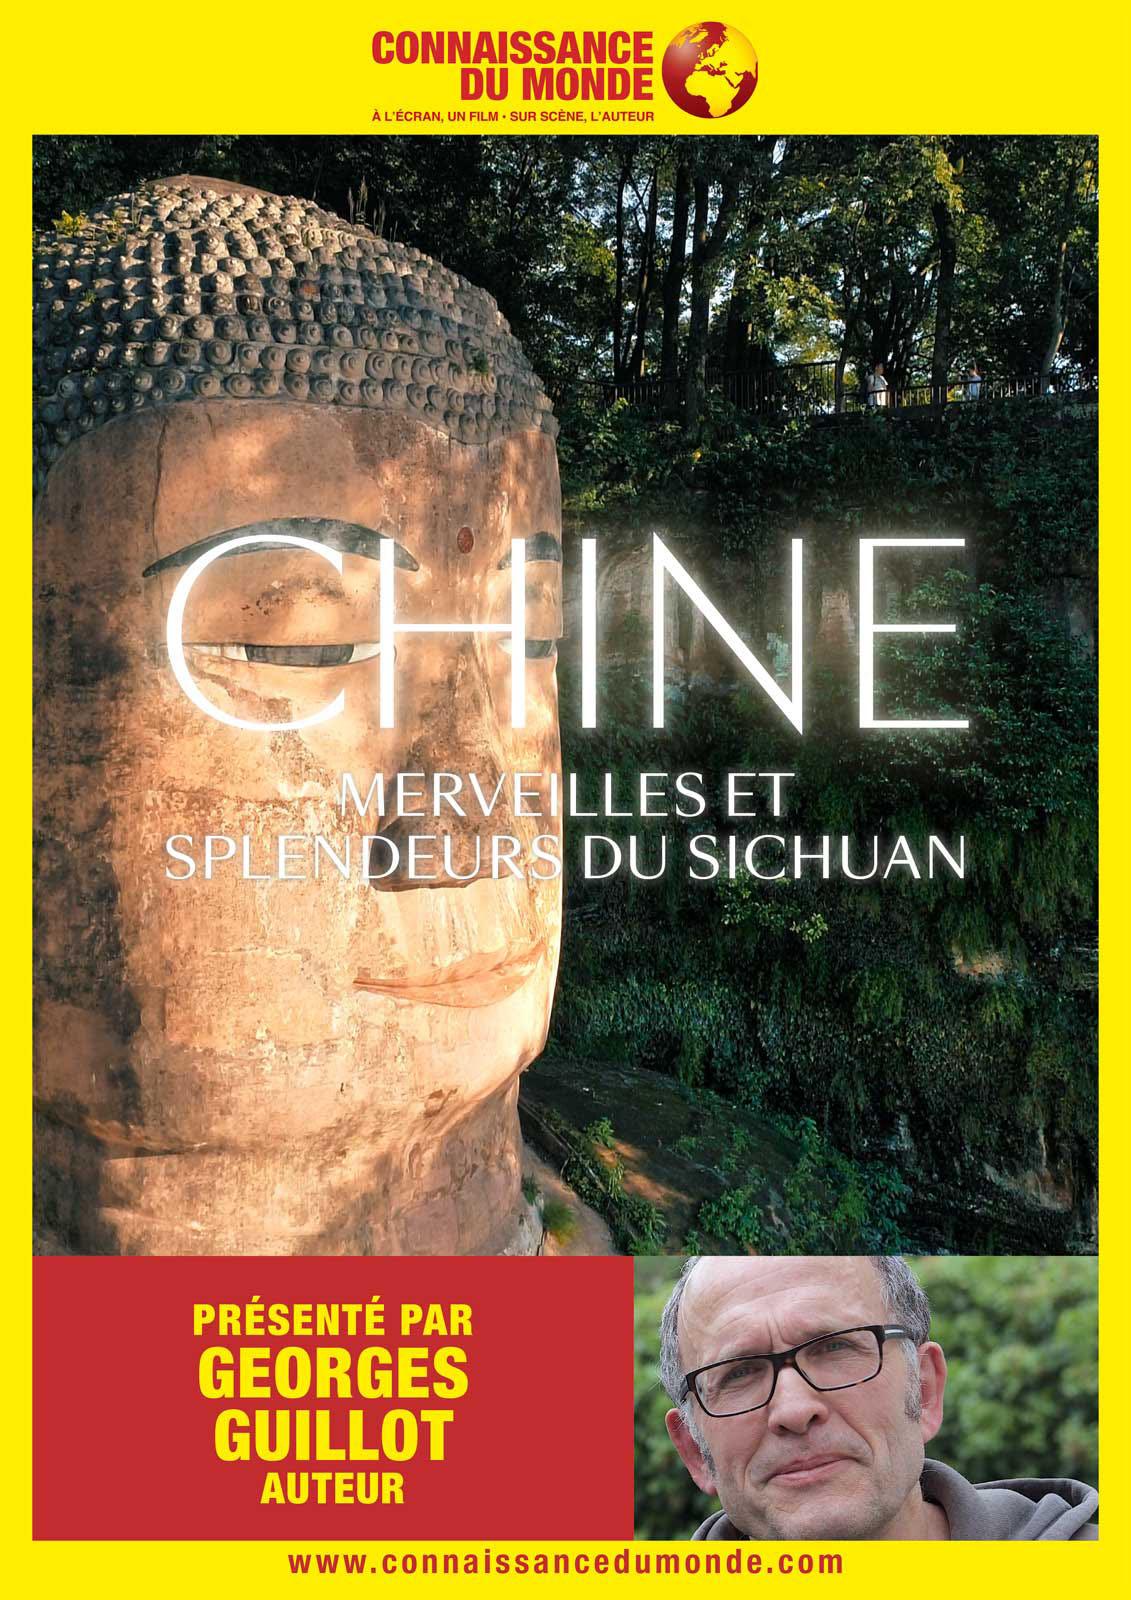 CHINE, Merveilles et splendeurs du Sichuan